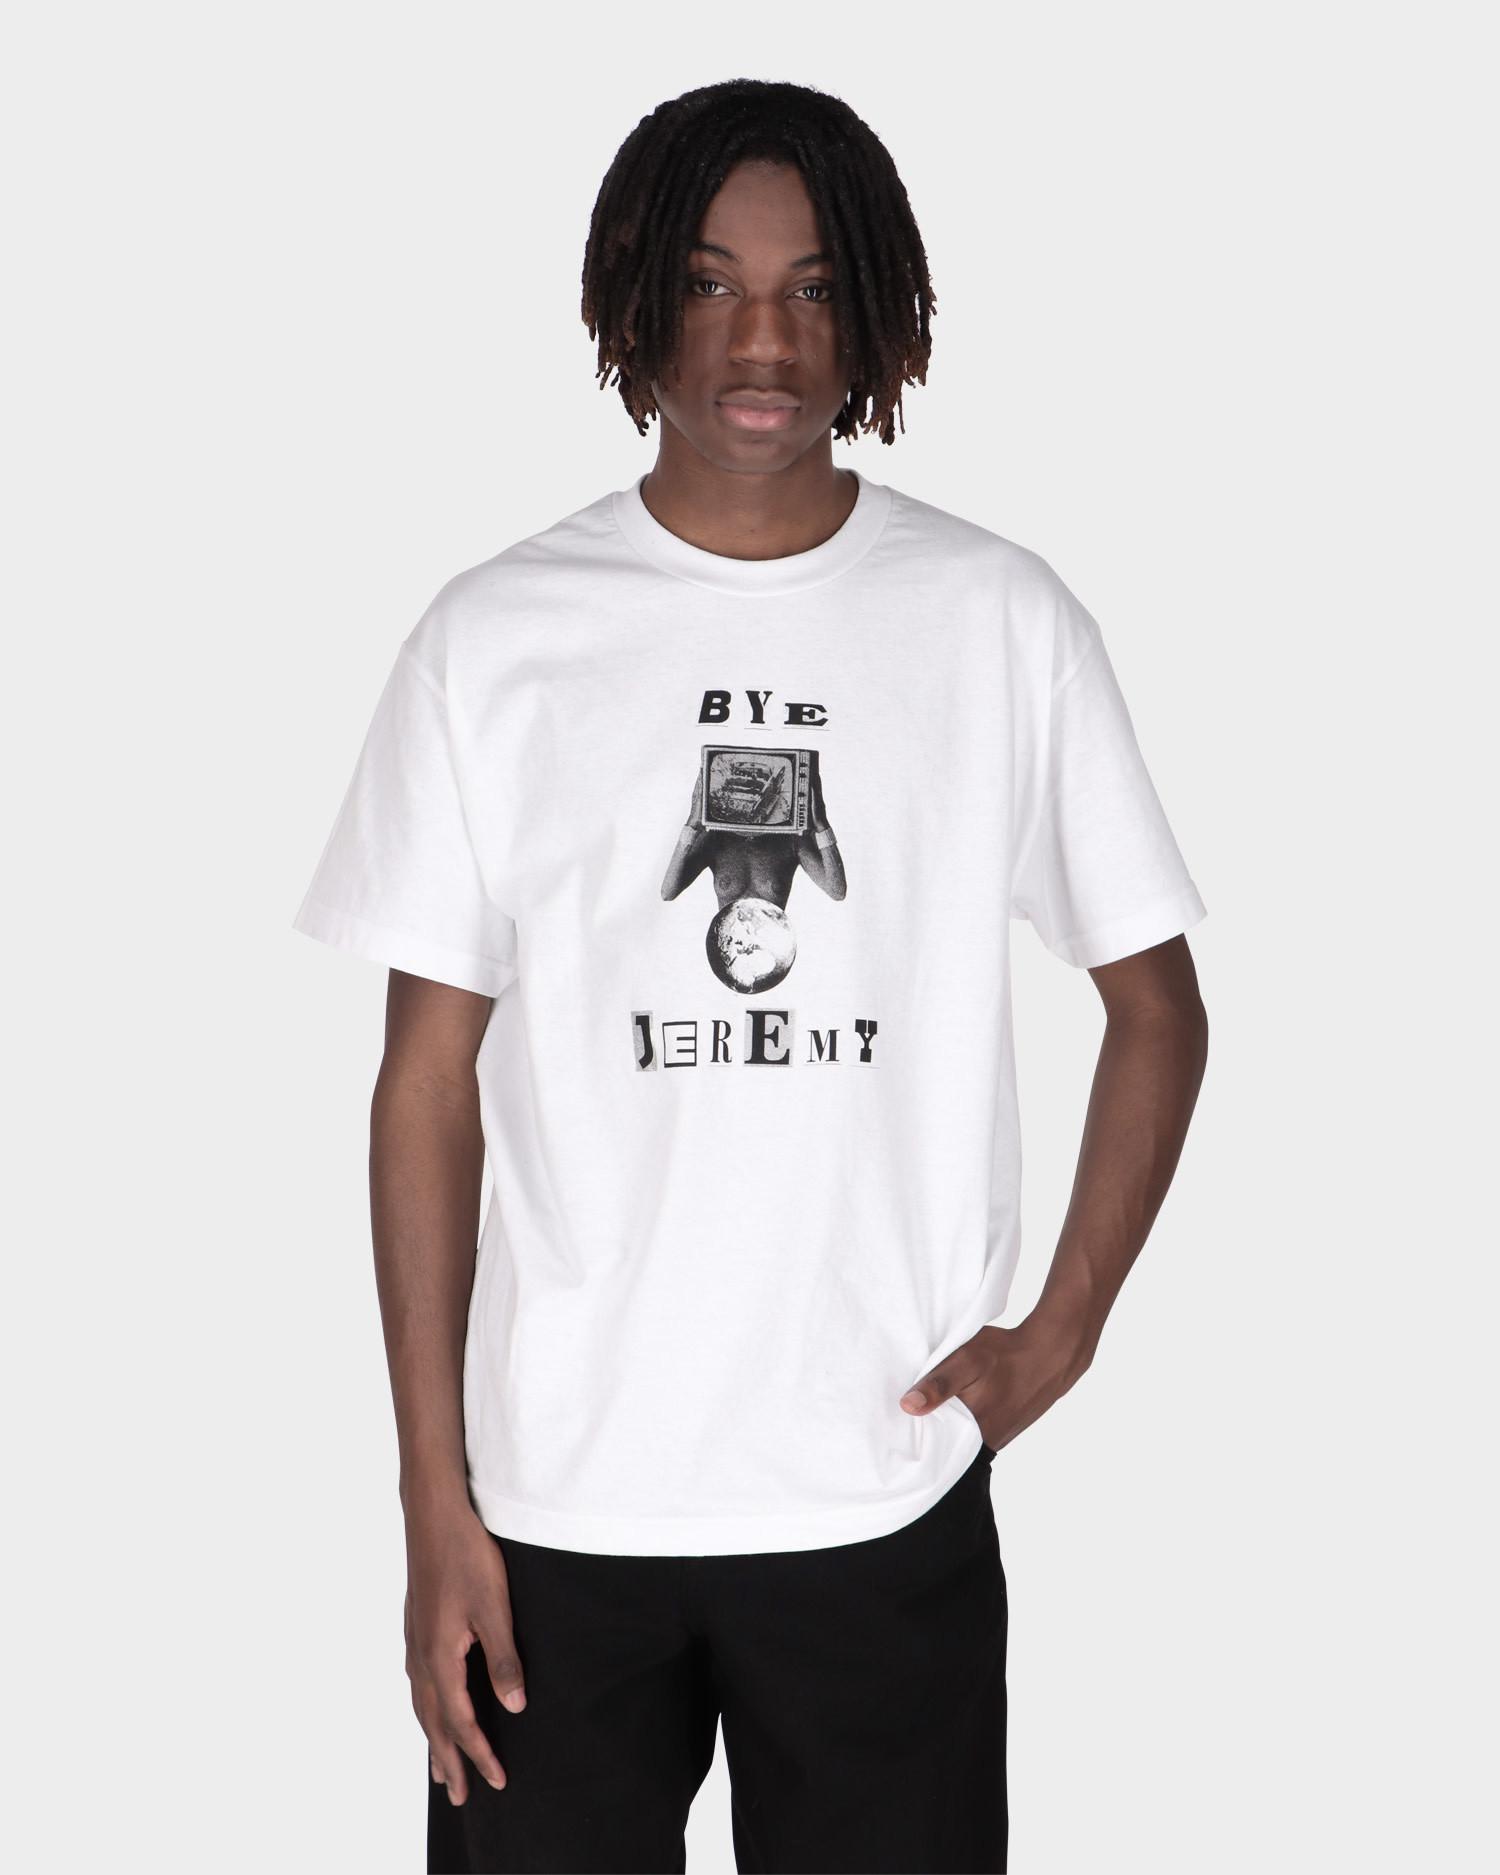 Bye Jeremy White Lenny T-shirt